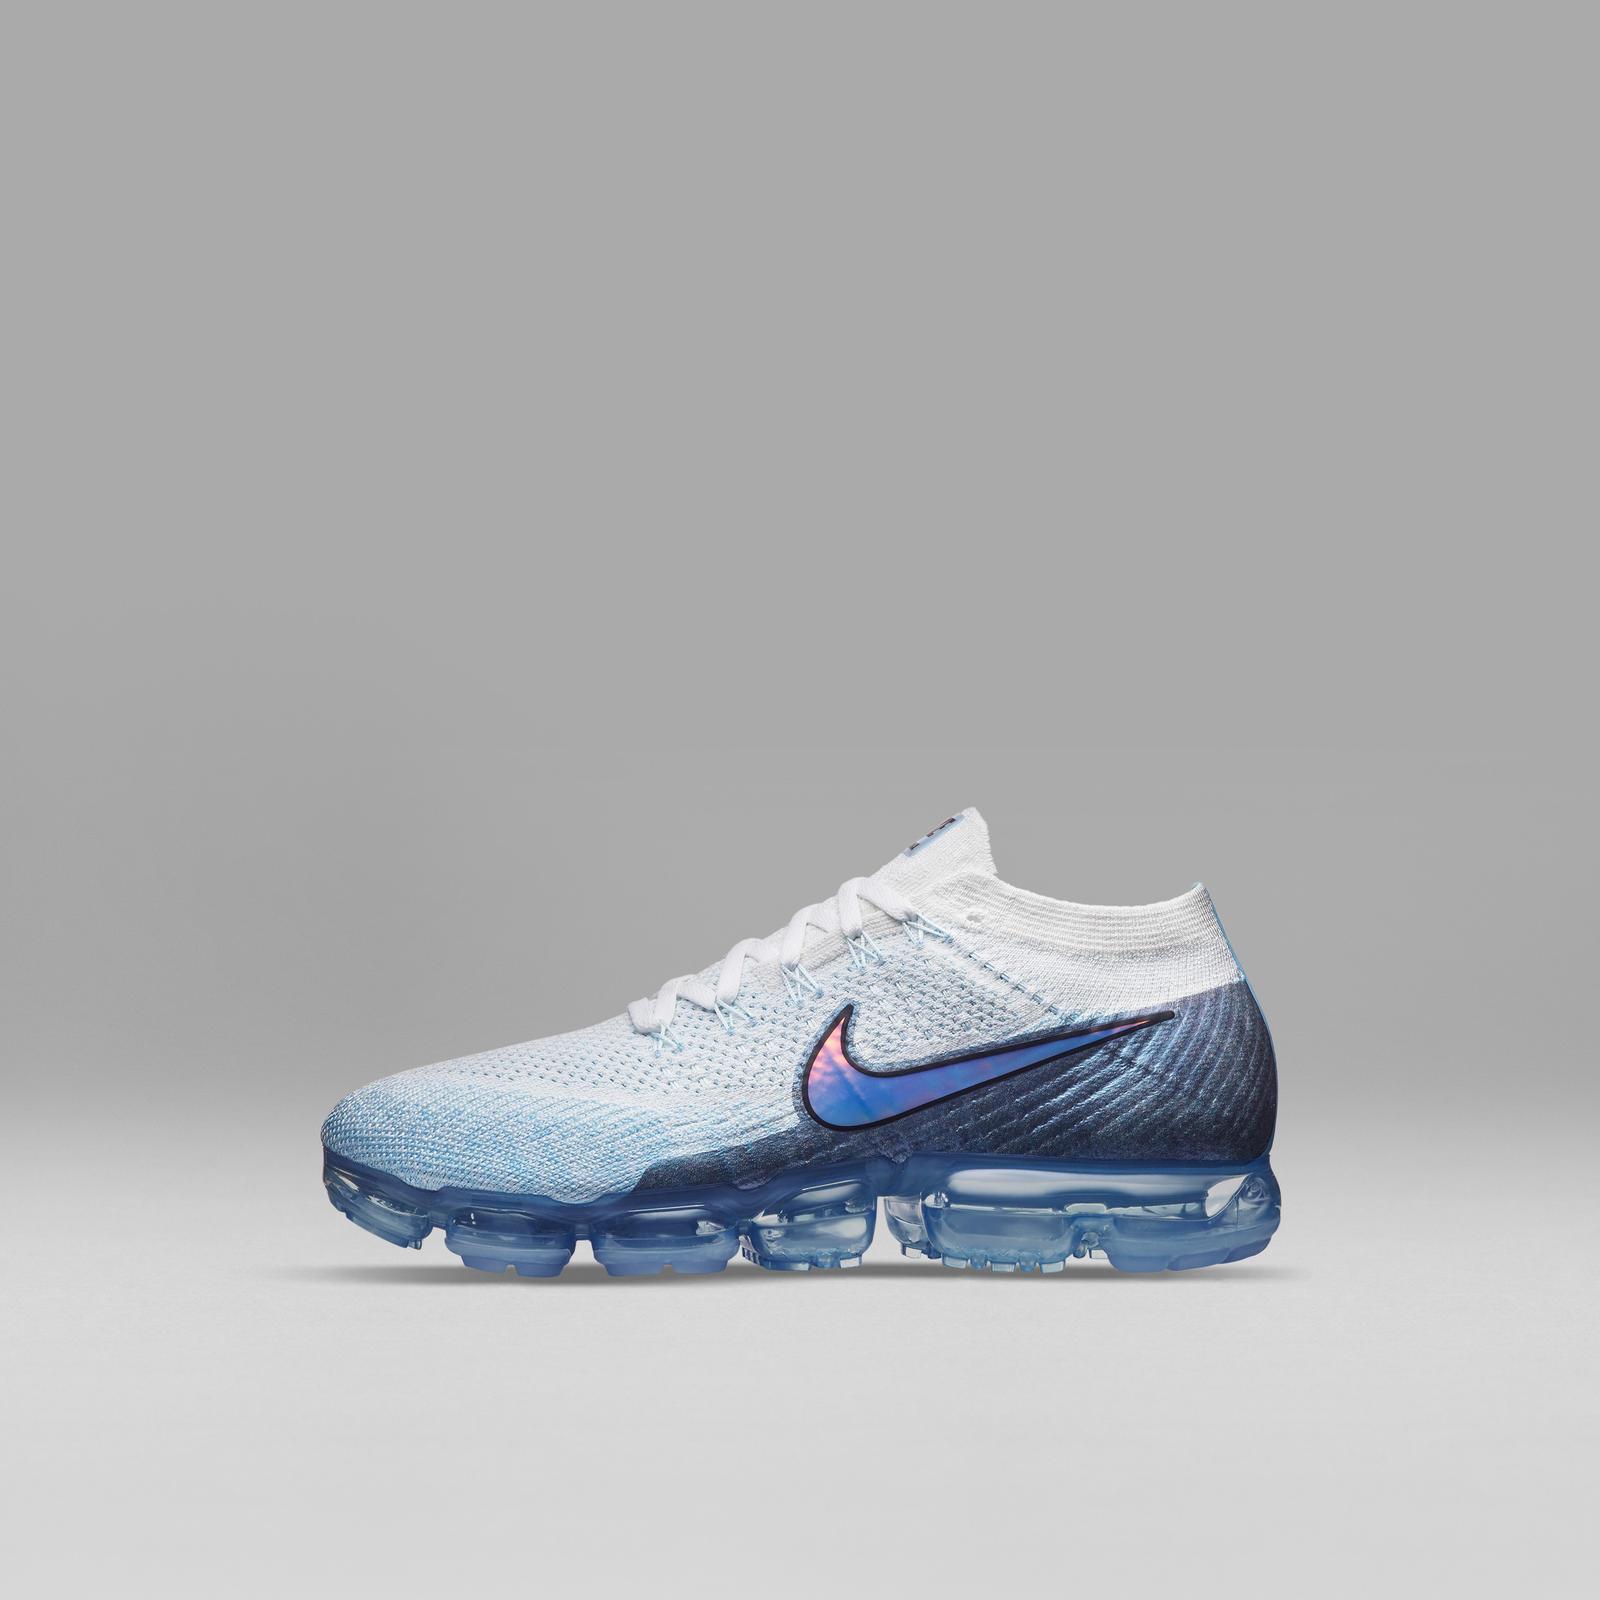 Nike Innovation 2016 Products - Nike News